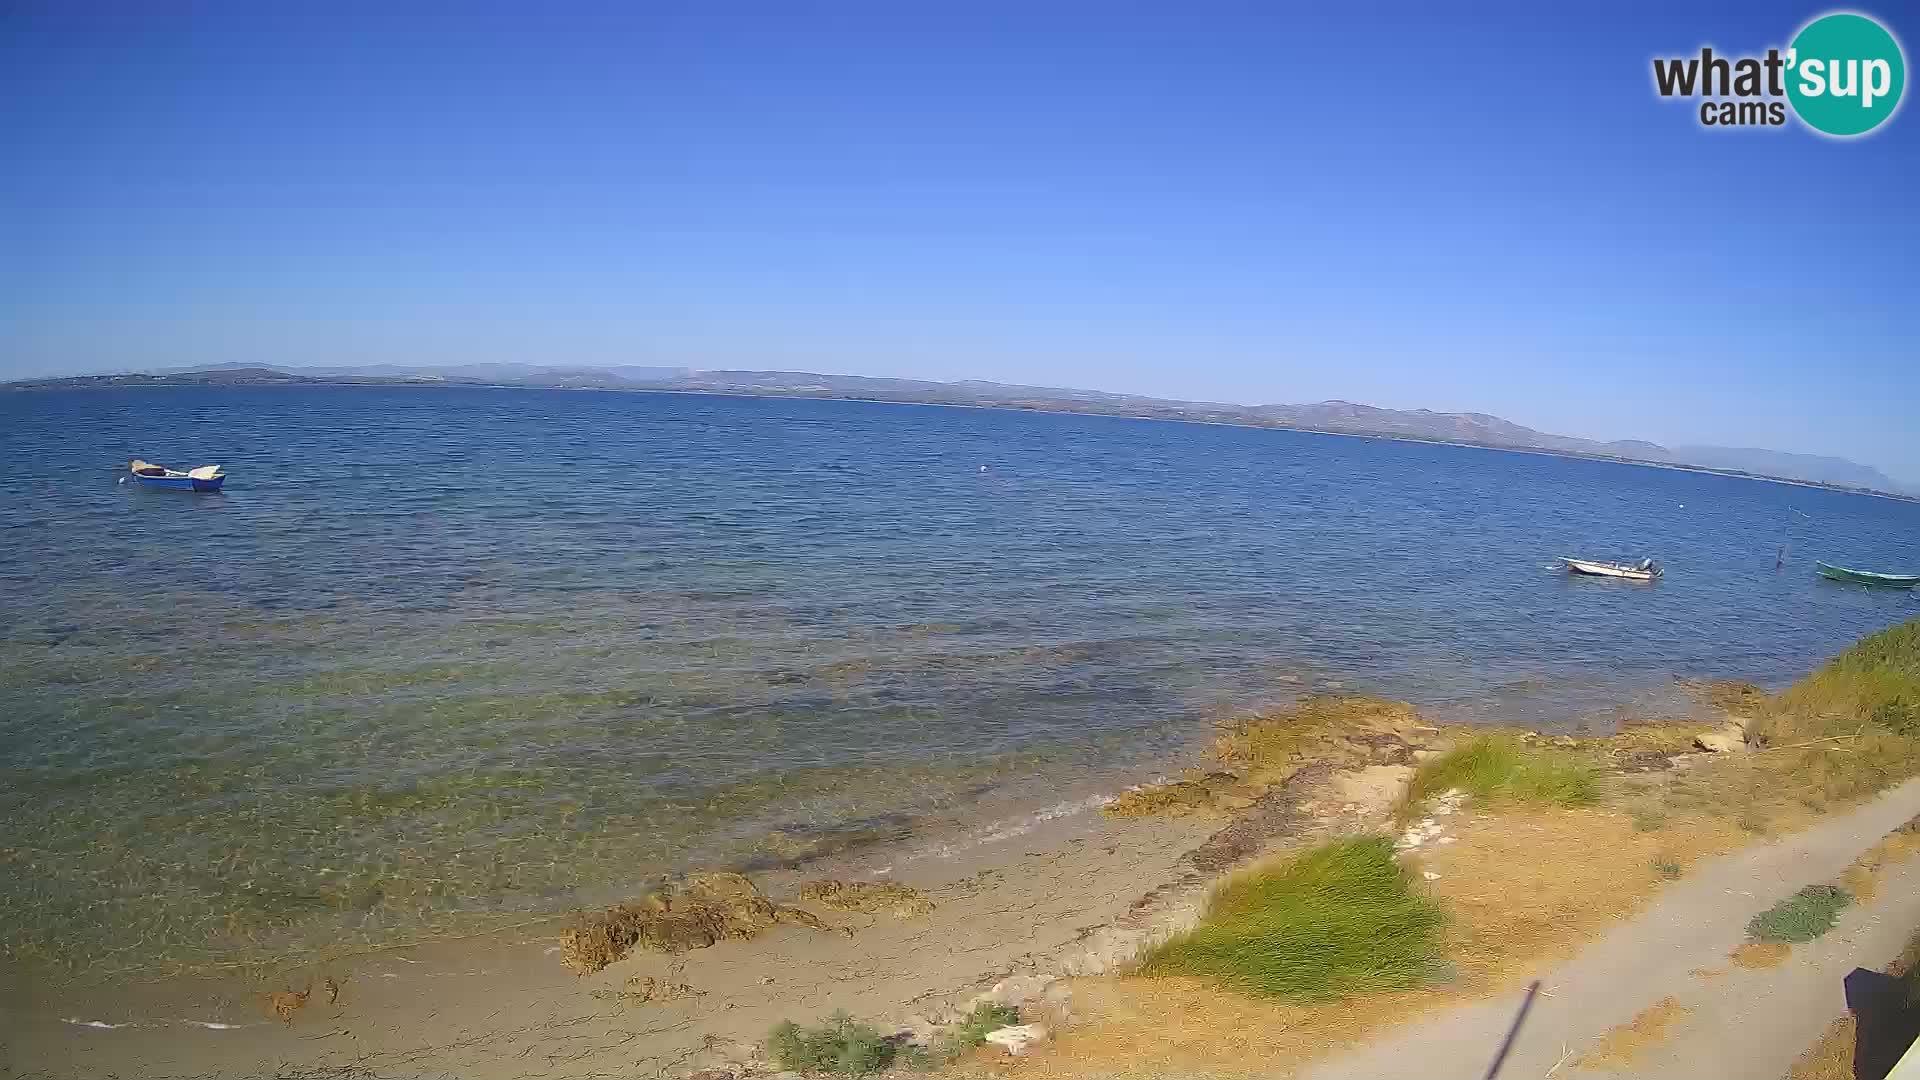 Windsurfing Club Sa Barra Webcam live Sant'Antioco – Sardinien – Italien